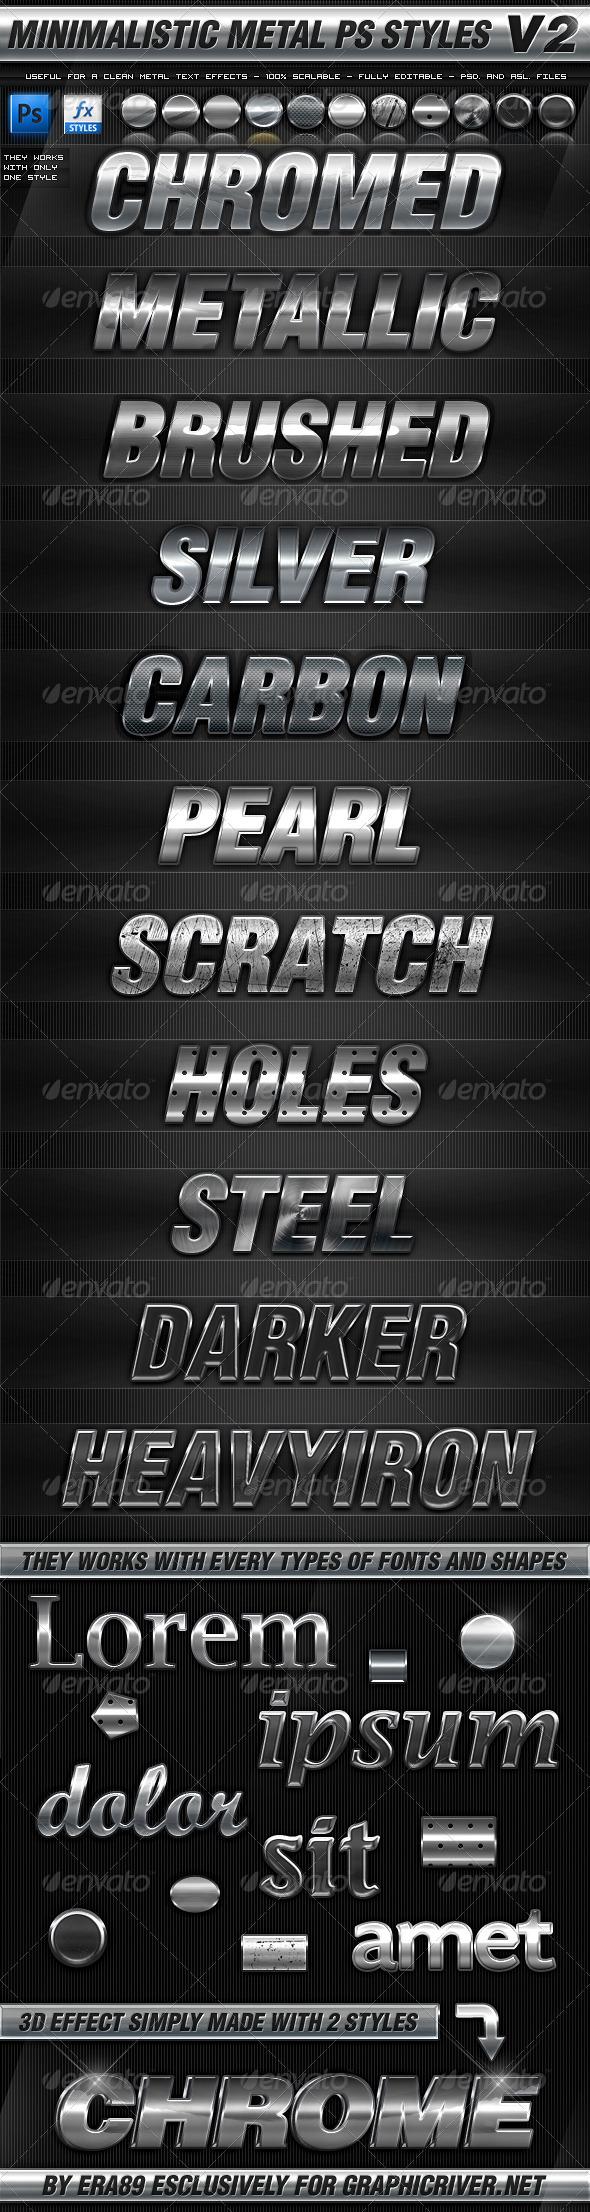 GraphicRiver Minimalistic Metal Styles V2 3660727